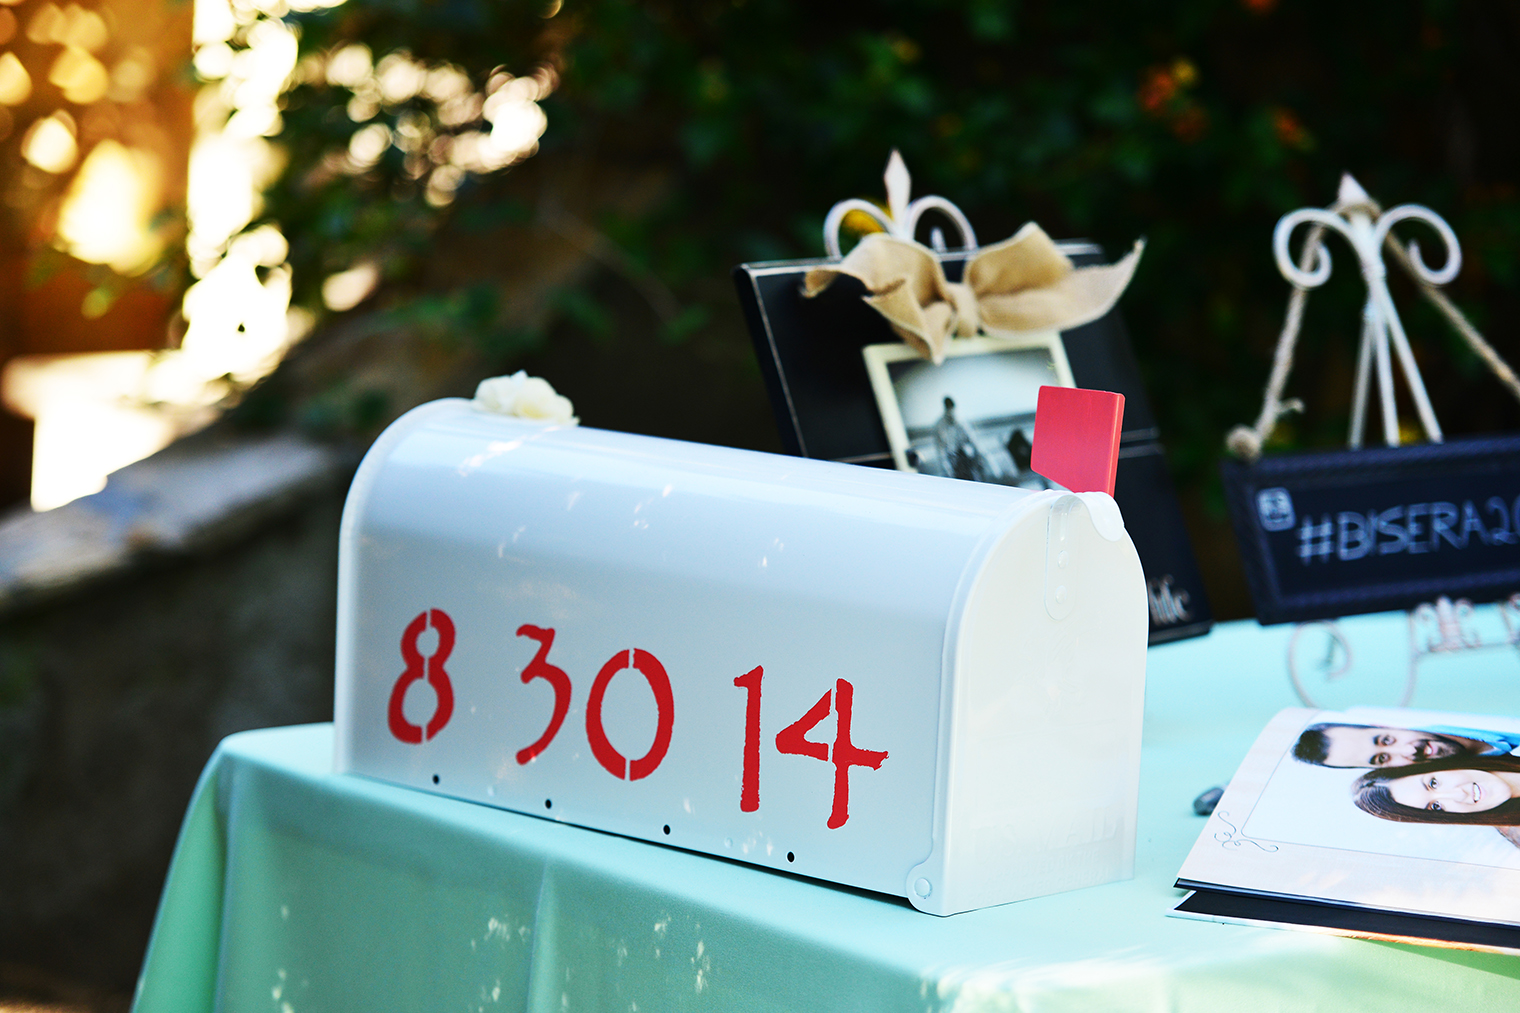 cake, wedding cake, stephy wong photography, wedding details, recetion decor, rustic wedding decor